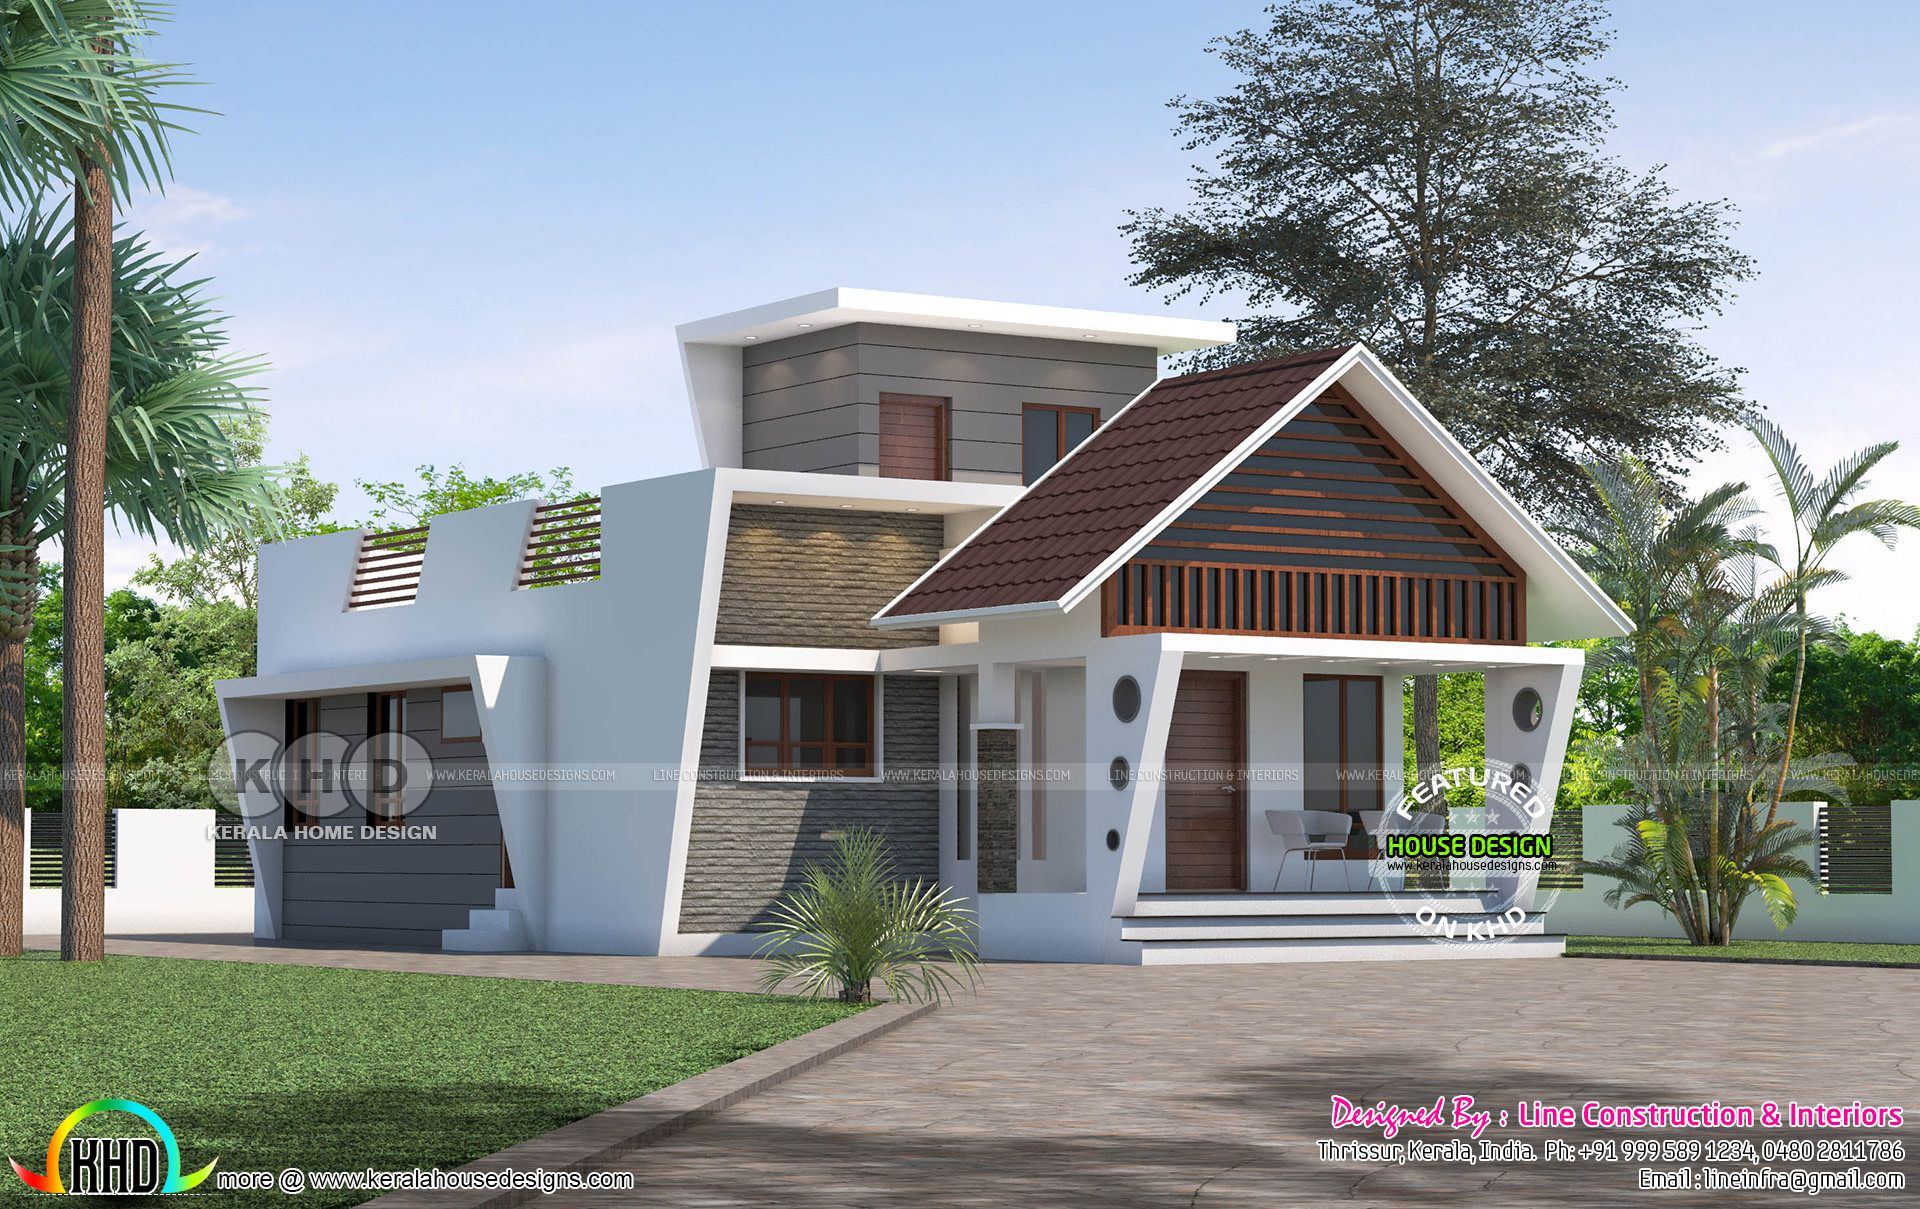 Unique Style Single 3 Bhk 1110 Sq Ft Home Kerala House Design Single Floor House Design House Front Design